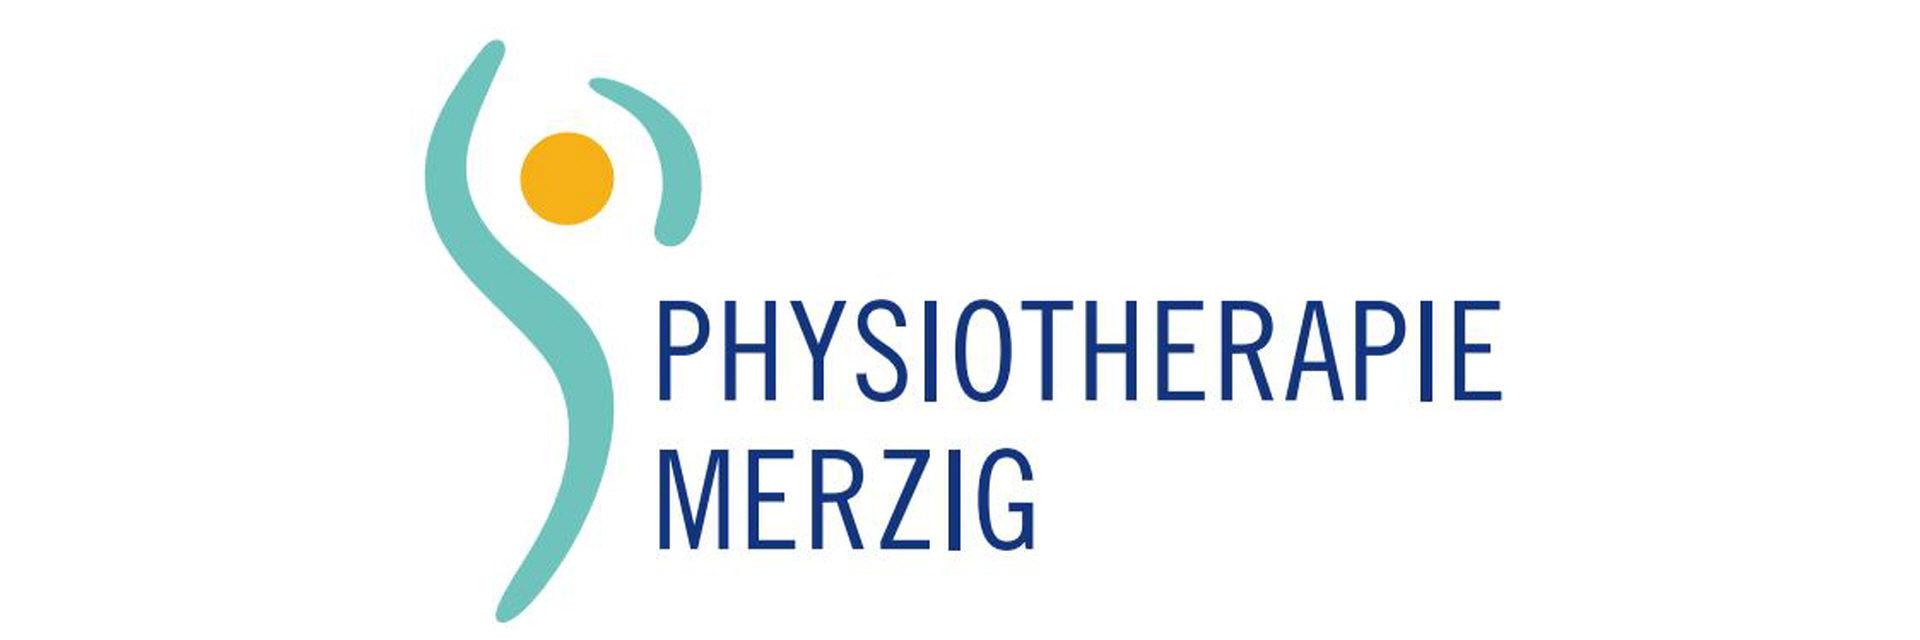 Physio merzig